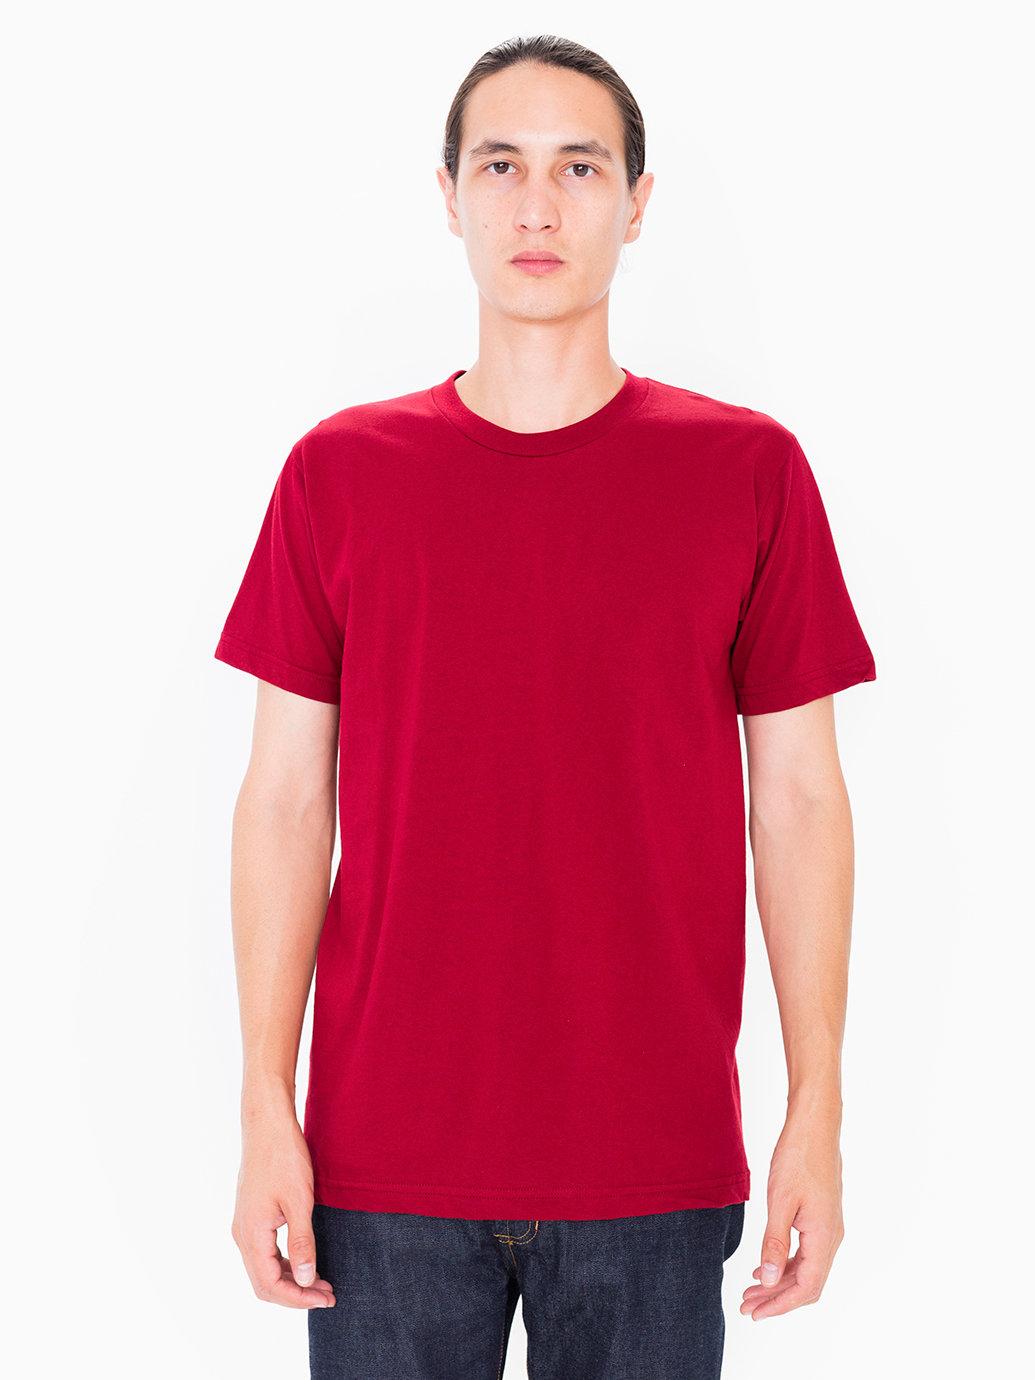 American apparel fine jersey crewneck t shirt in red for for American apparel fine jersey crewneck t shirt